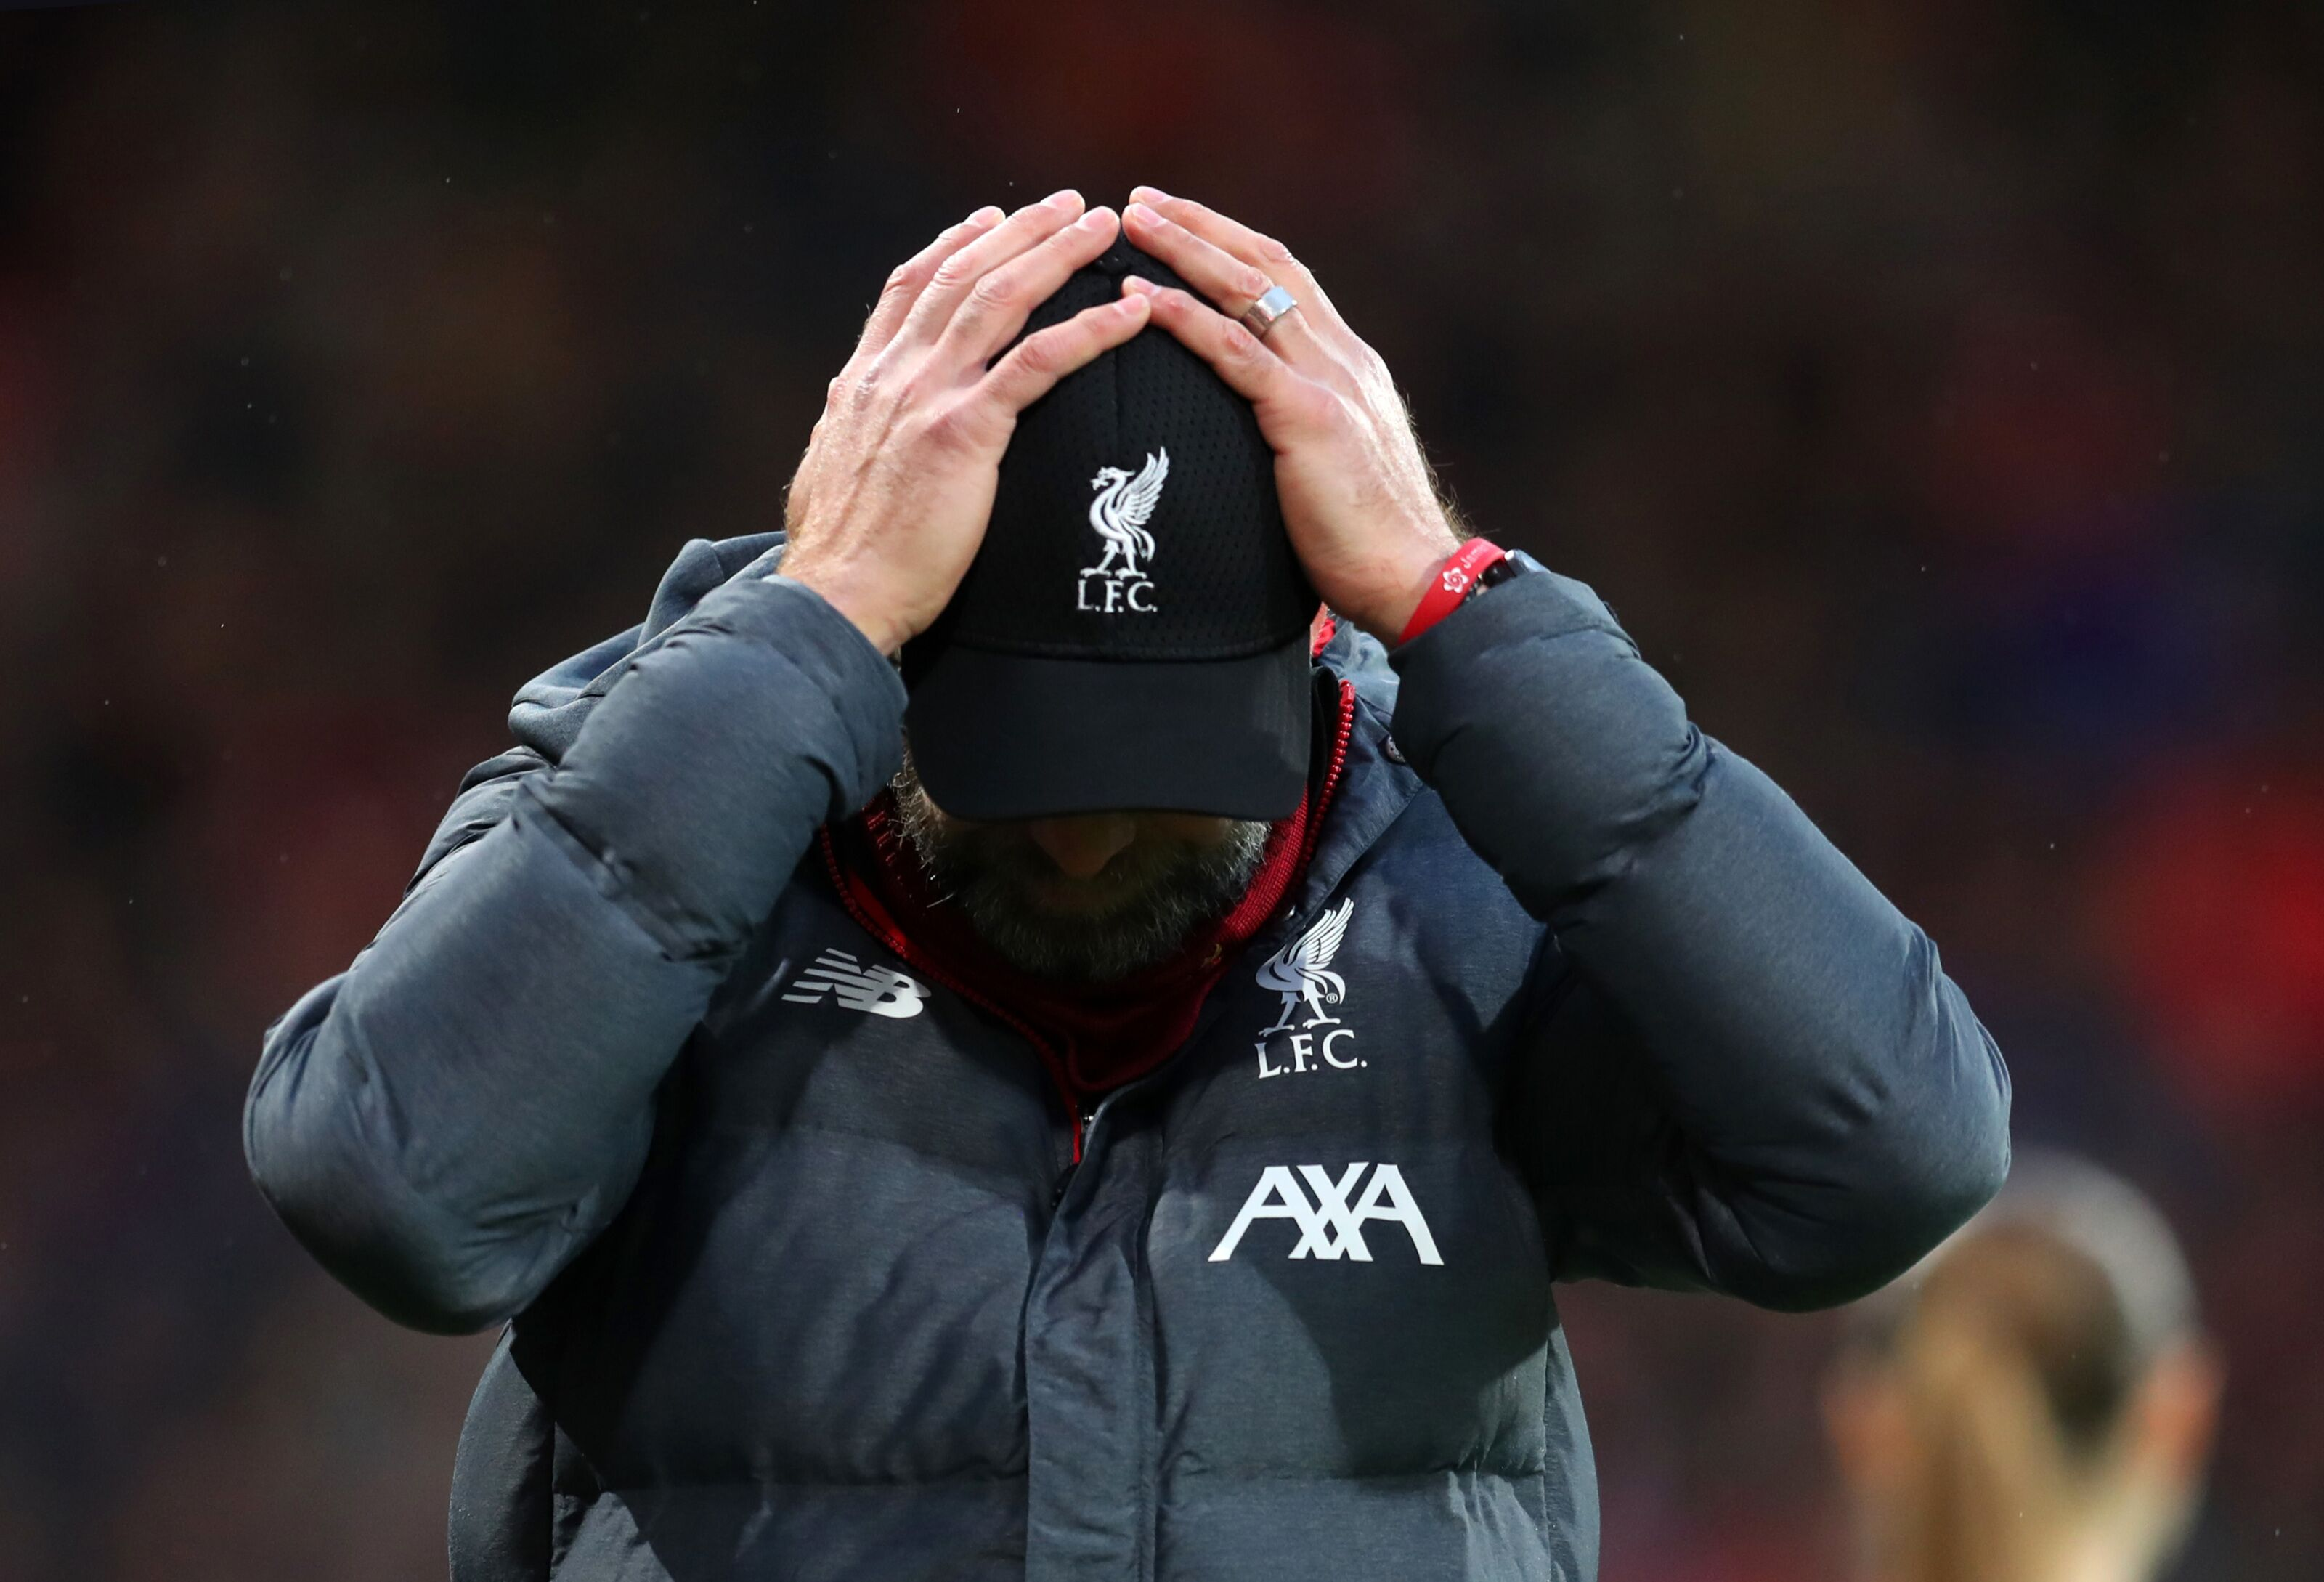 Liverpool vs Watford: Upset Jurgen Klopp confirms 'serious' muscle injury